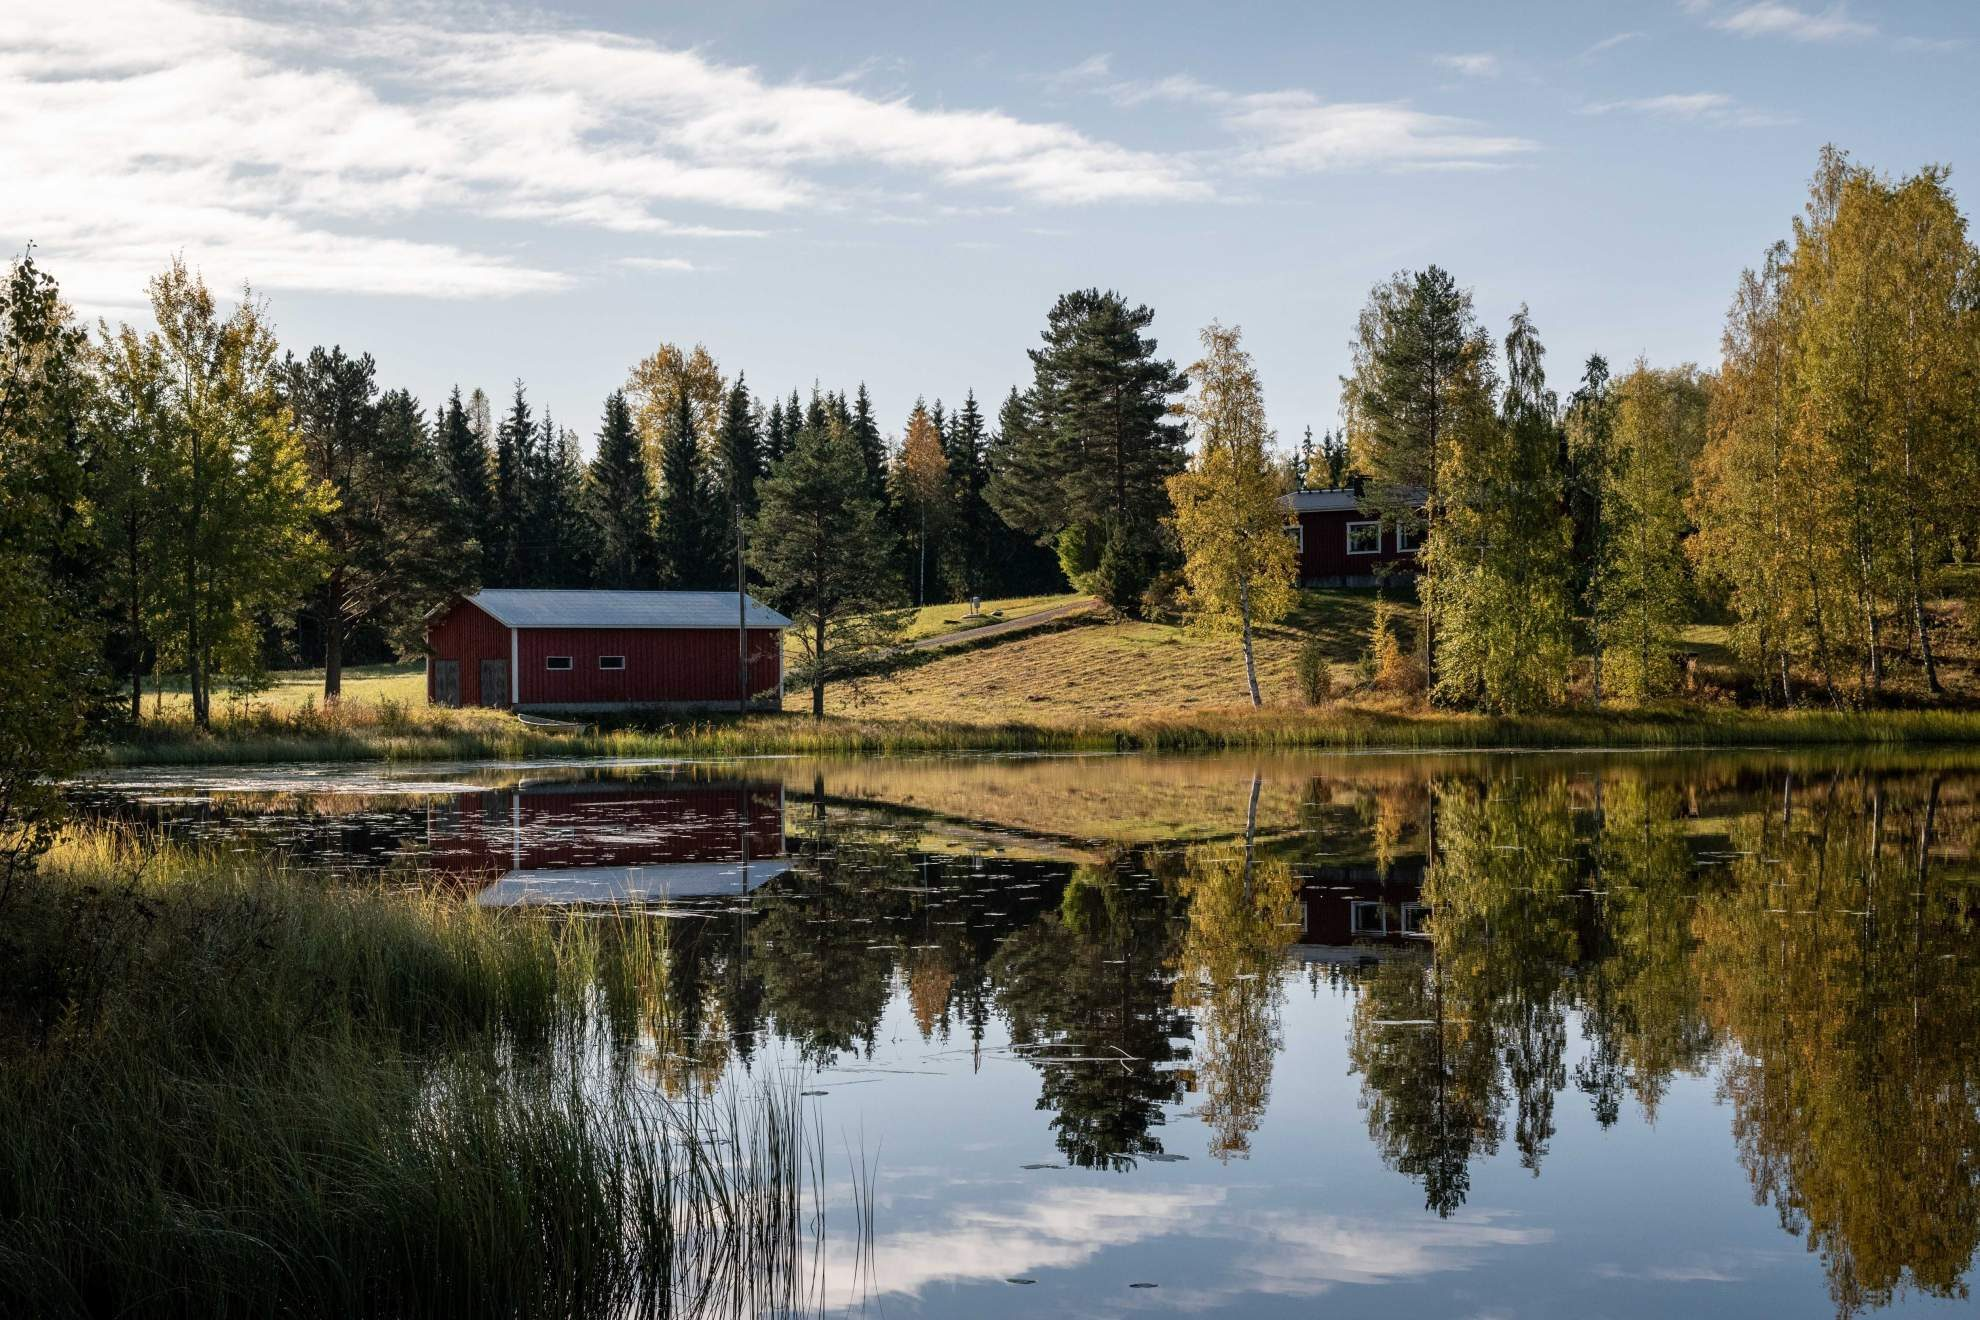 pexels olivier darny 3109271 1980x1320 - Studia w Finlandii